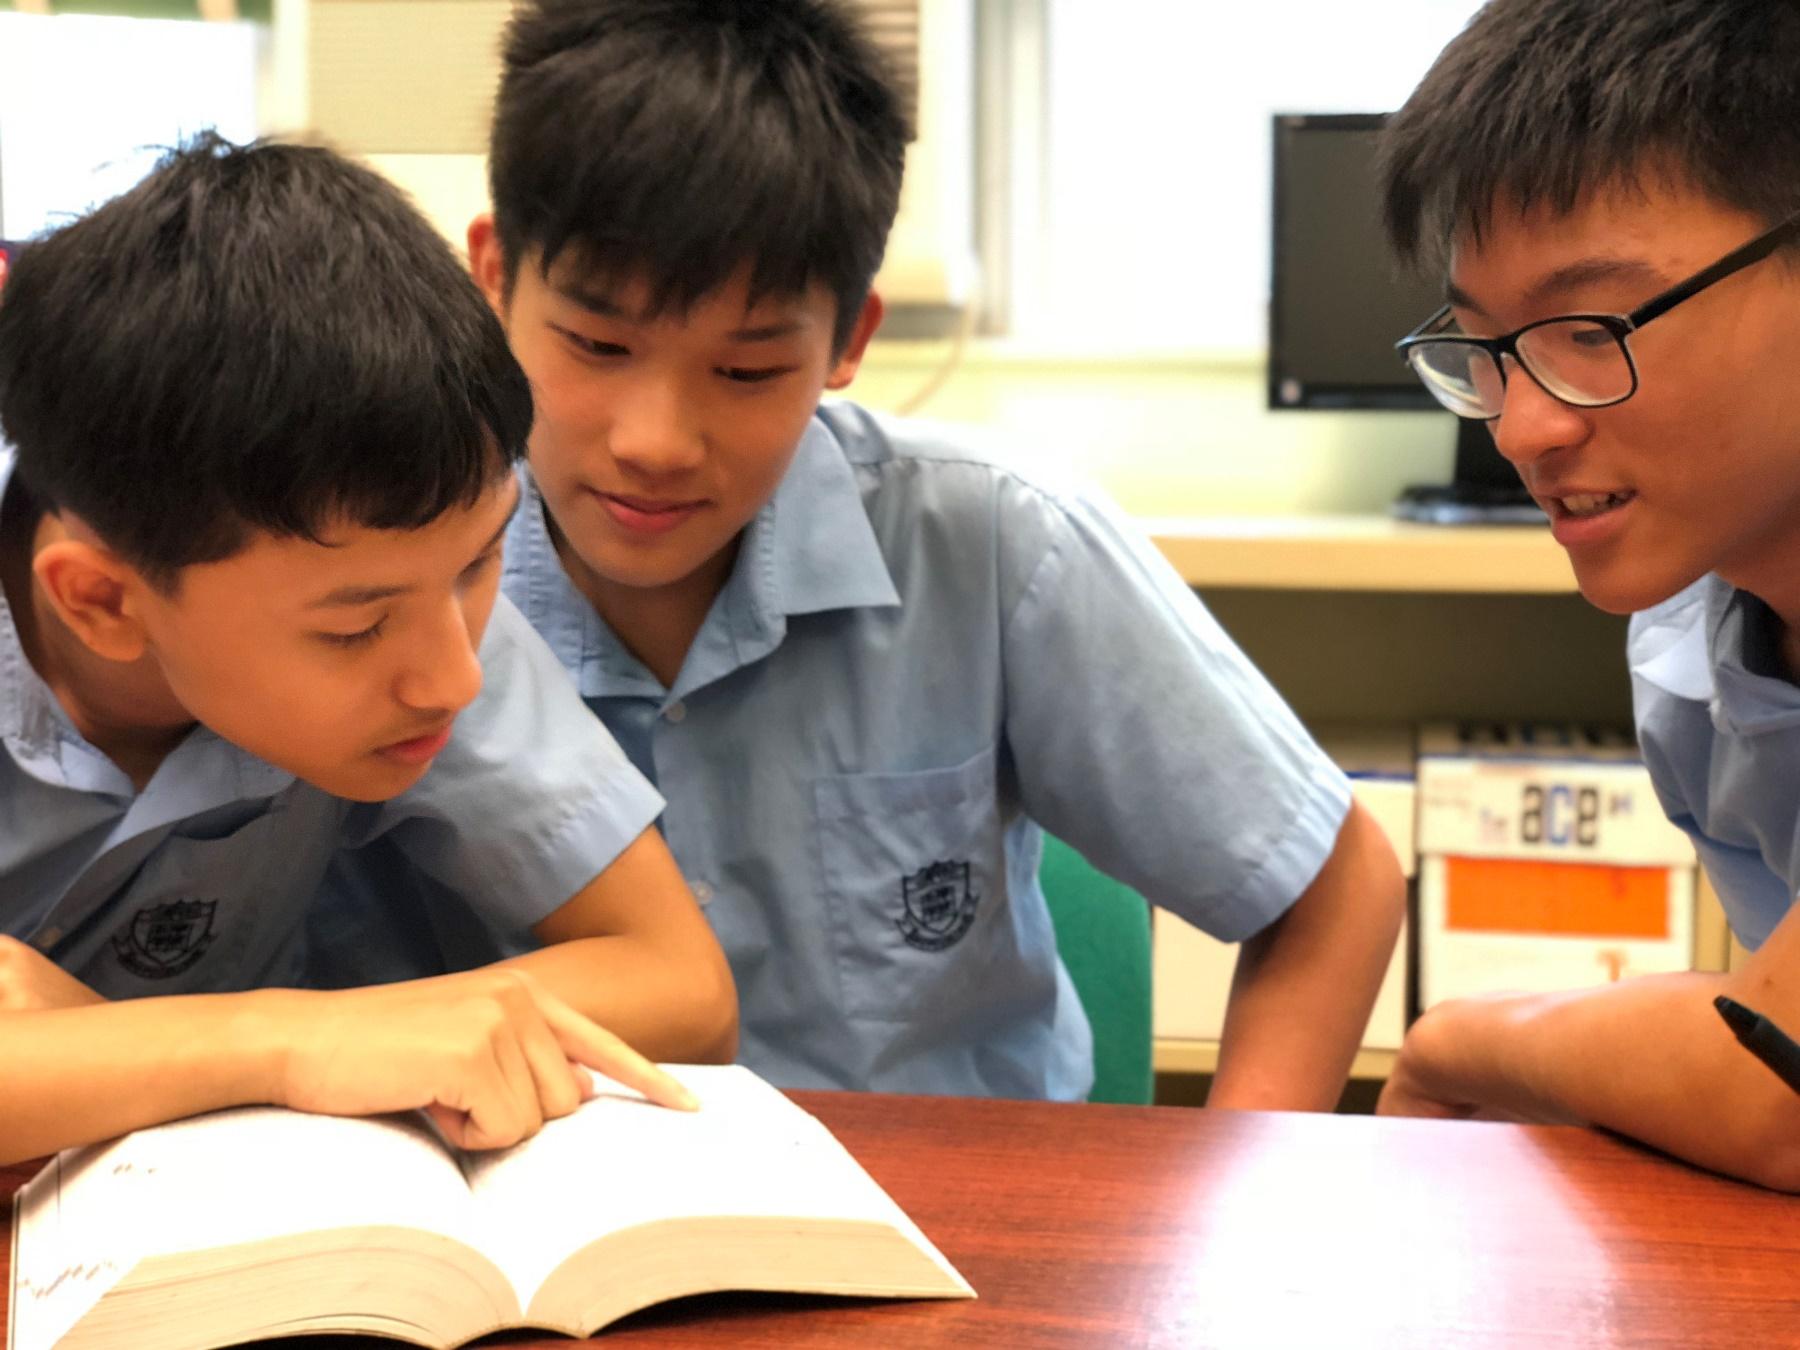 http://npc.edu.hk/sites/default/files/img_9600.jpg